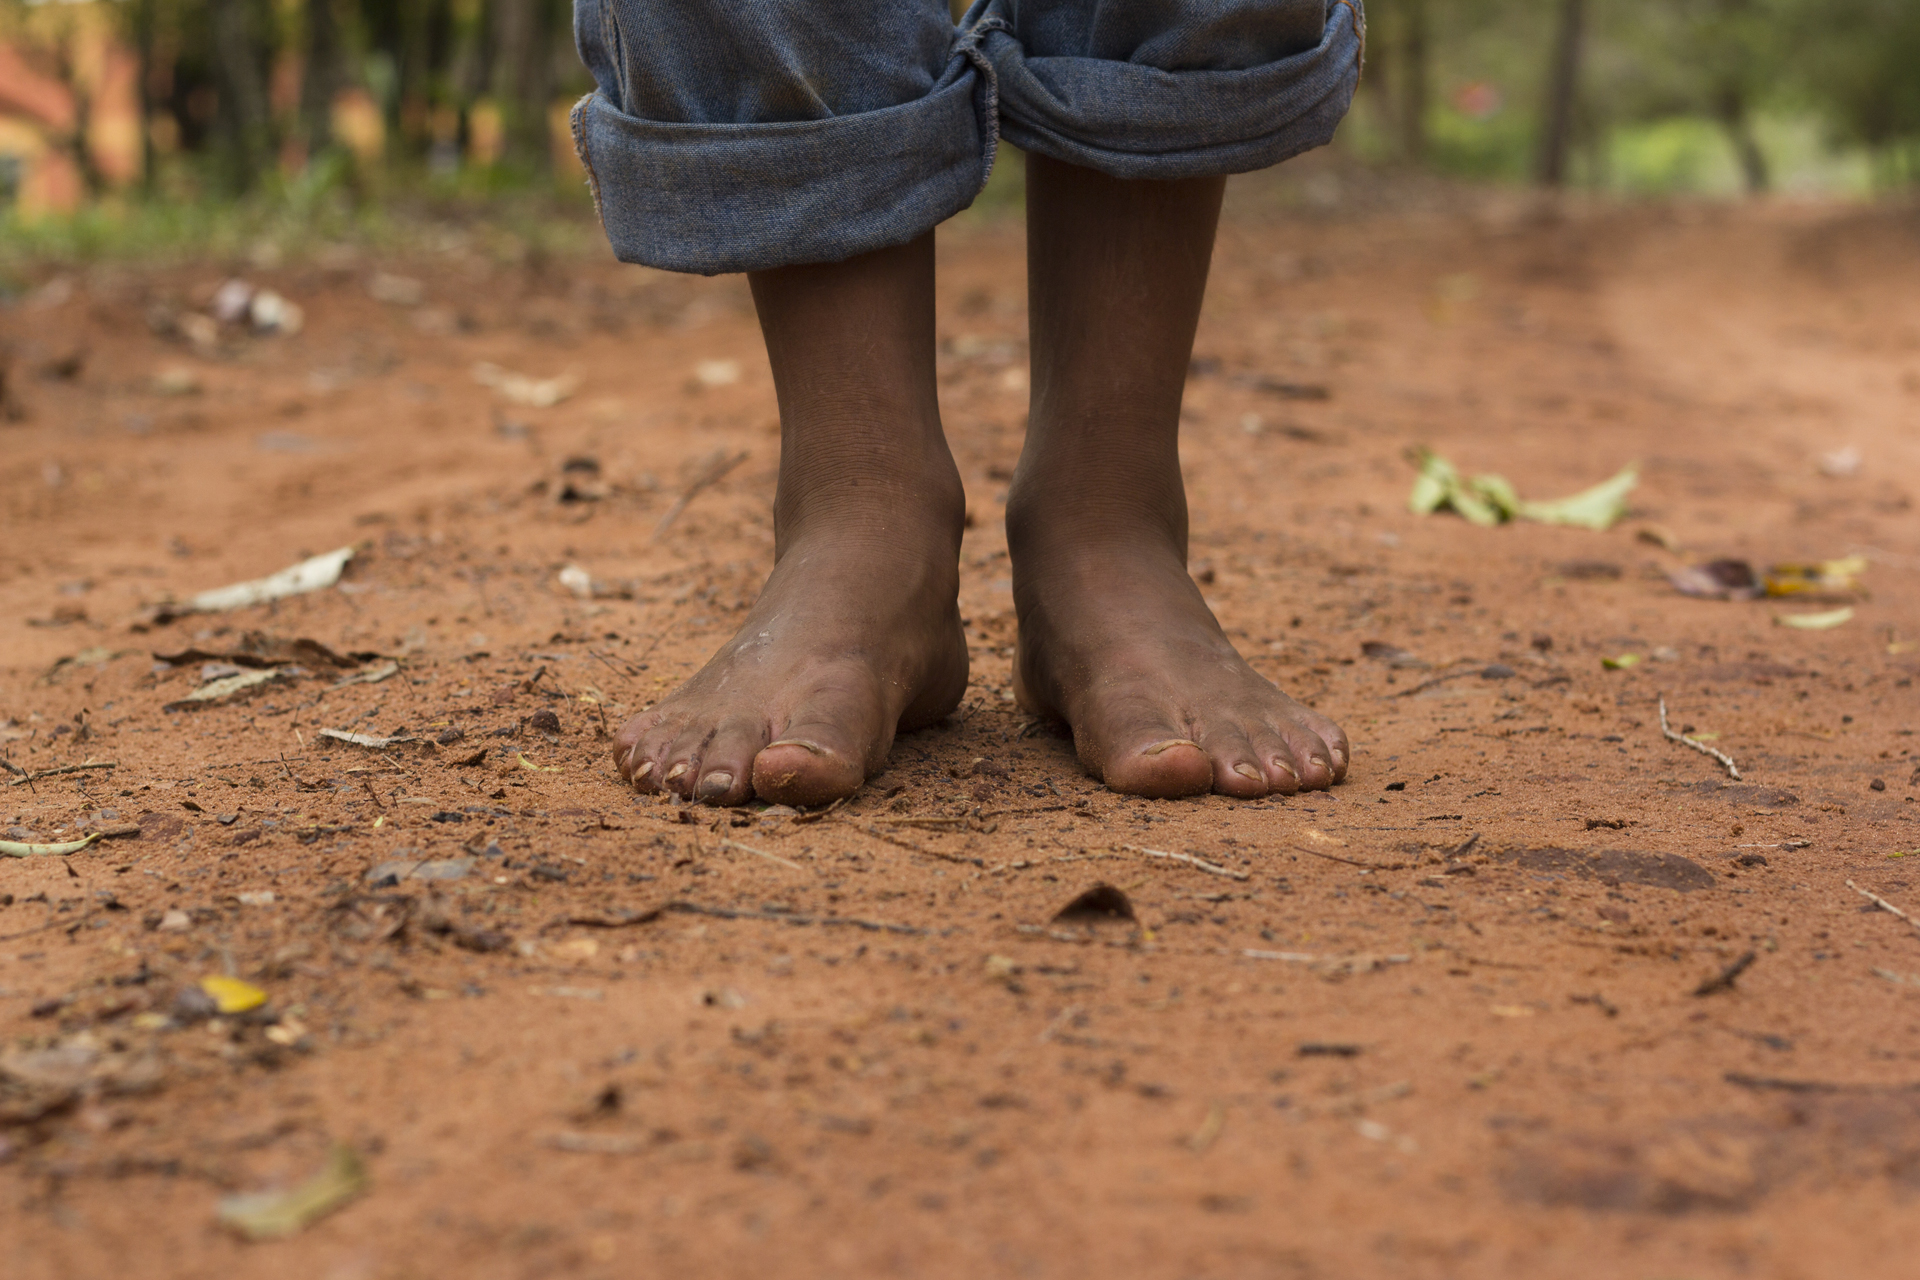 Feet Walking In Orthopedic Shoes